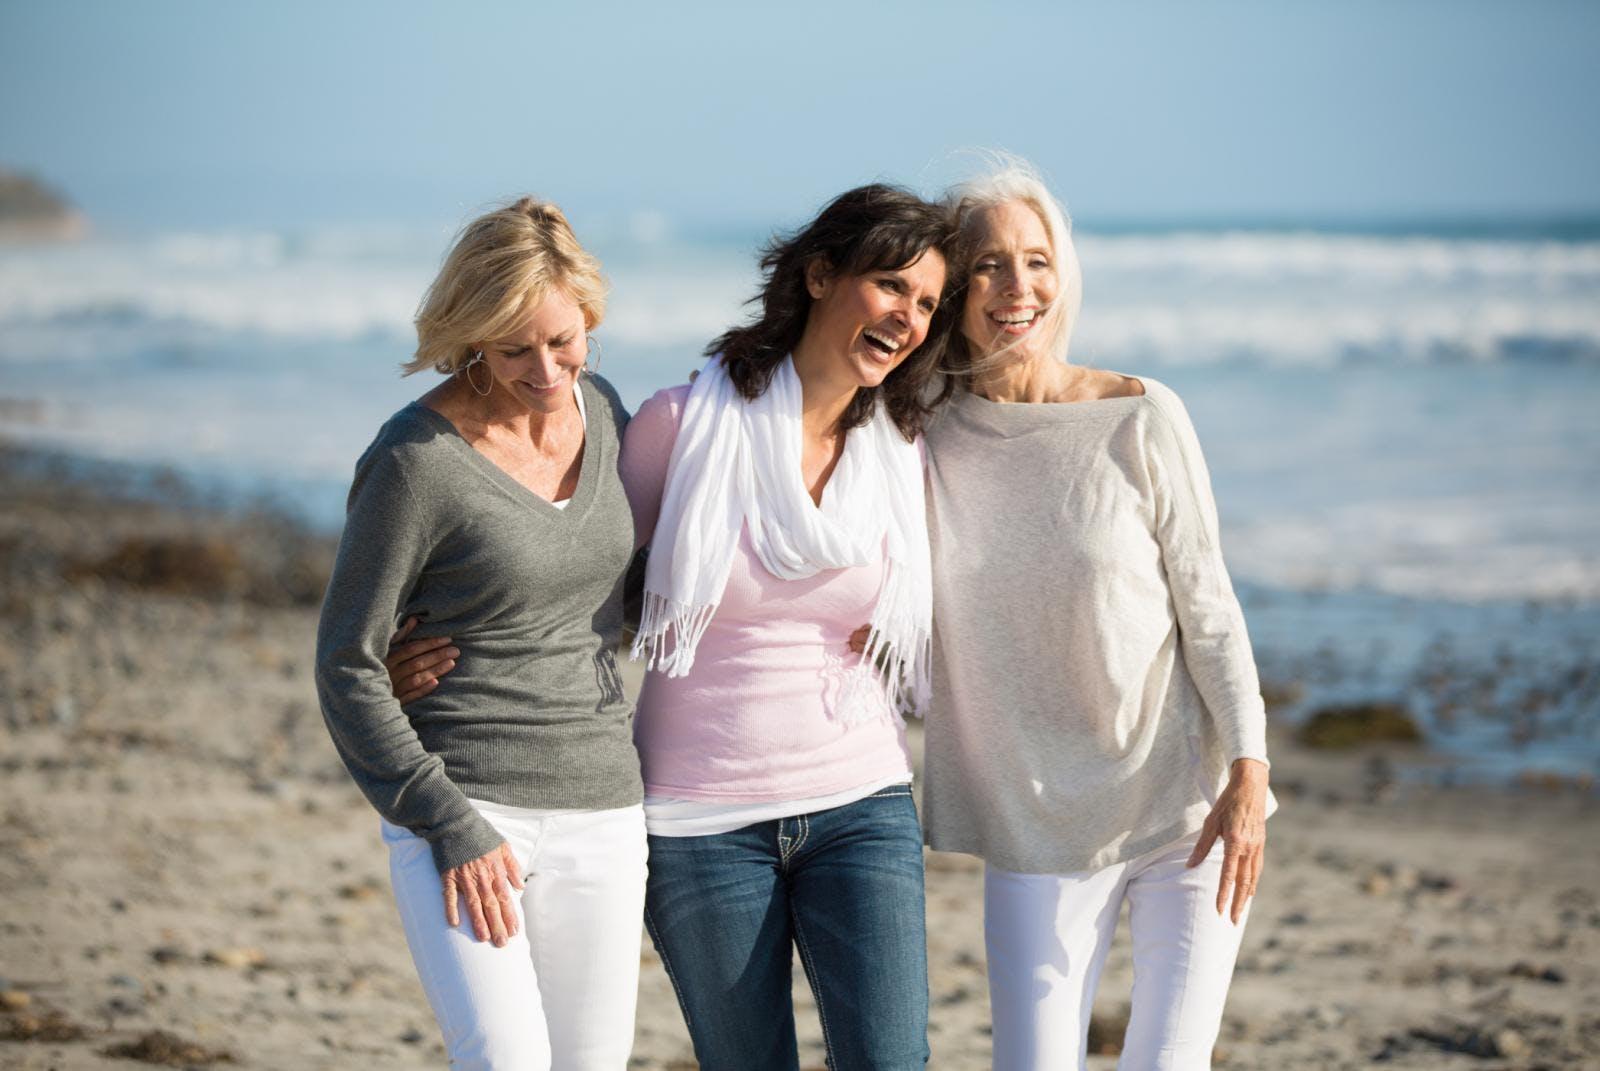 Three elderly ladies walking on the beach.